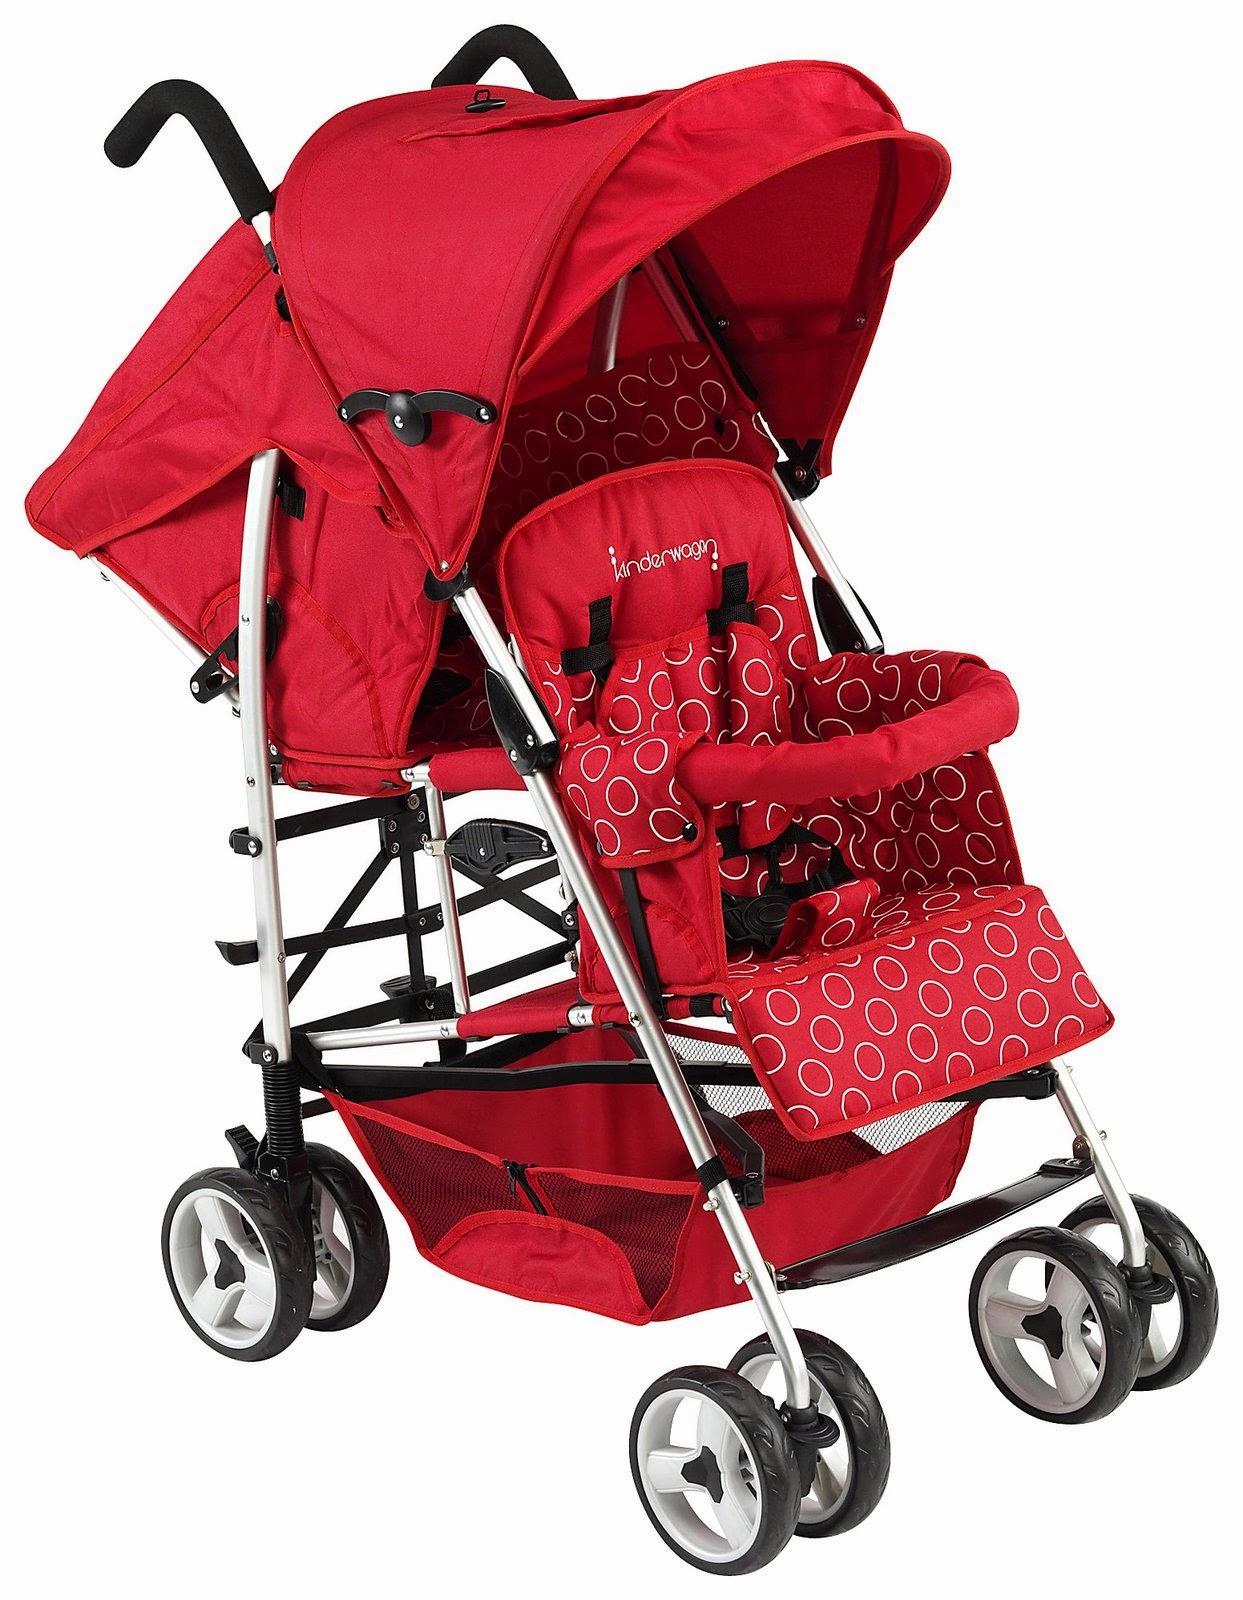 5 top twin stroller